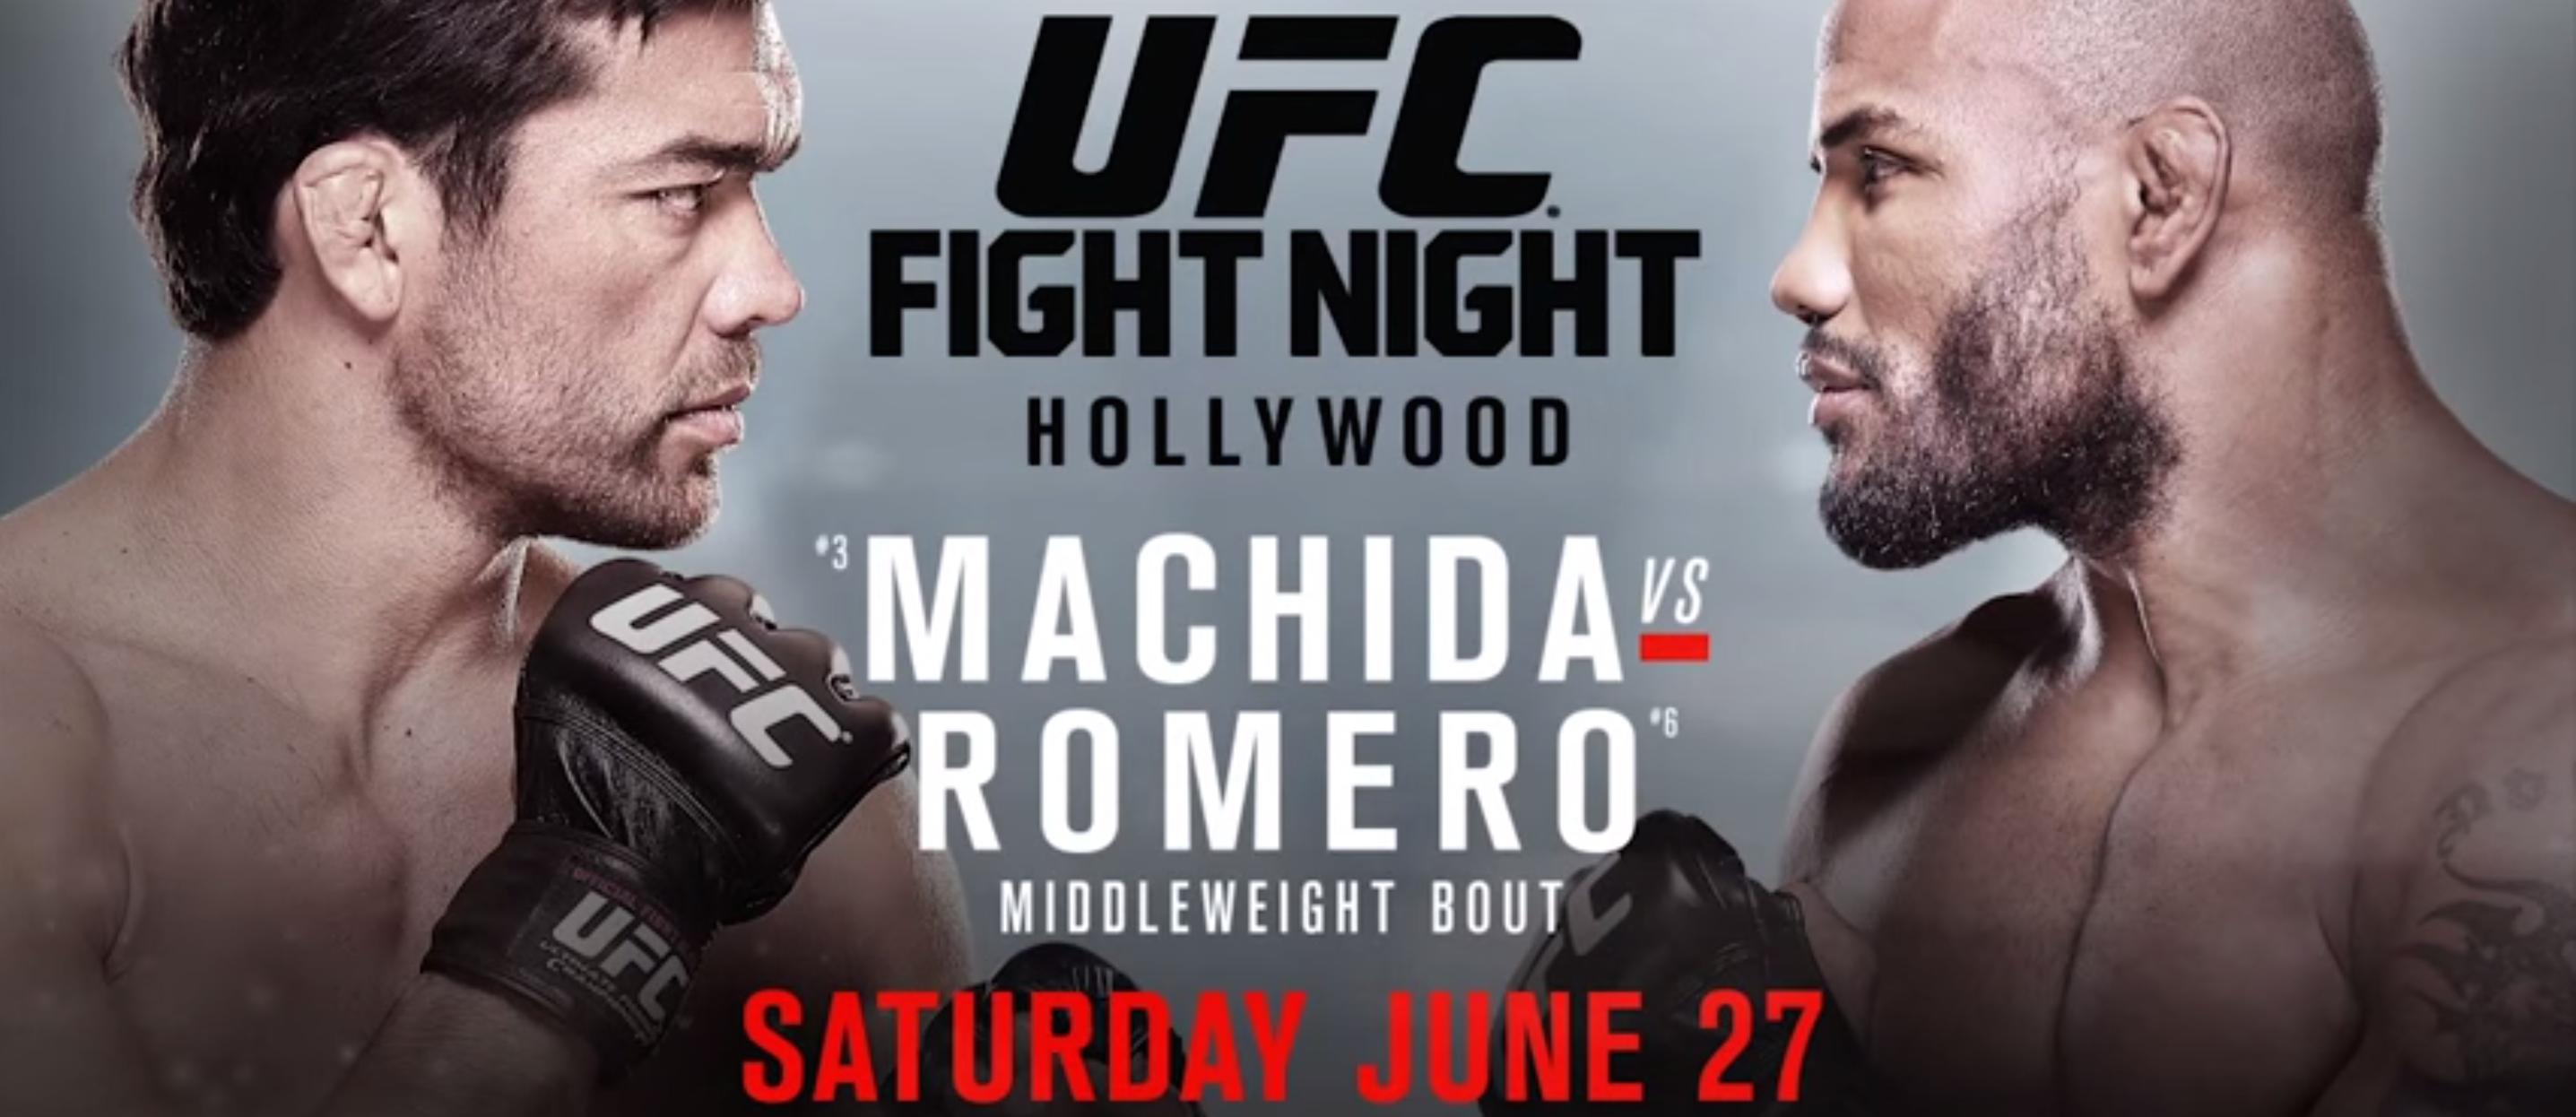 machida-vs-romero-betting-predictions-ufc-fight-night-70-betting-predictions-machida-vs-romero-picks-ufc-fight-night-70-picks-luca-fury-betting-guide-tips-odds-poster.png